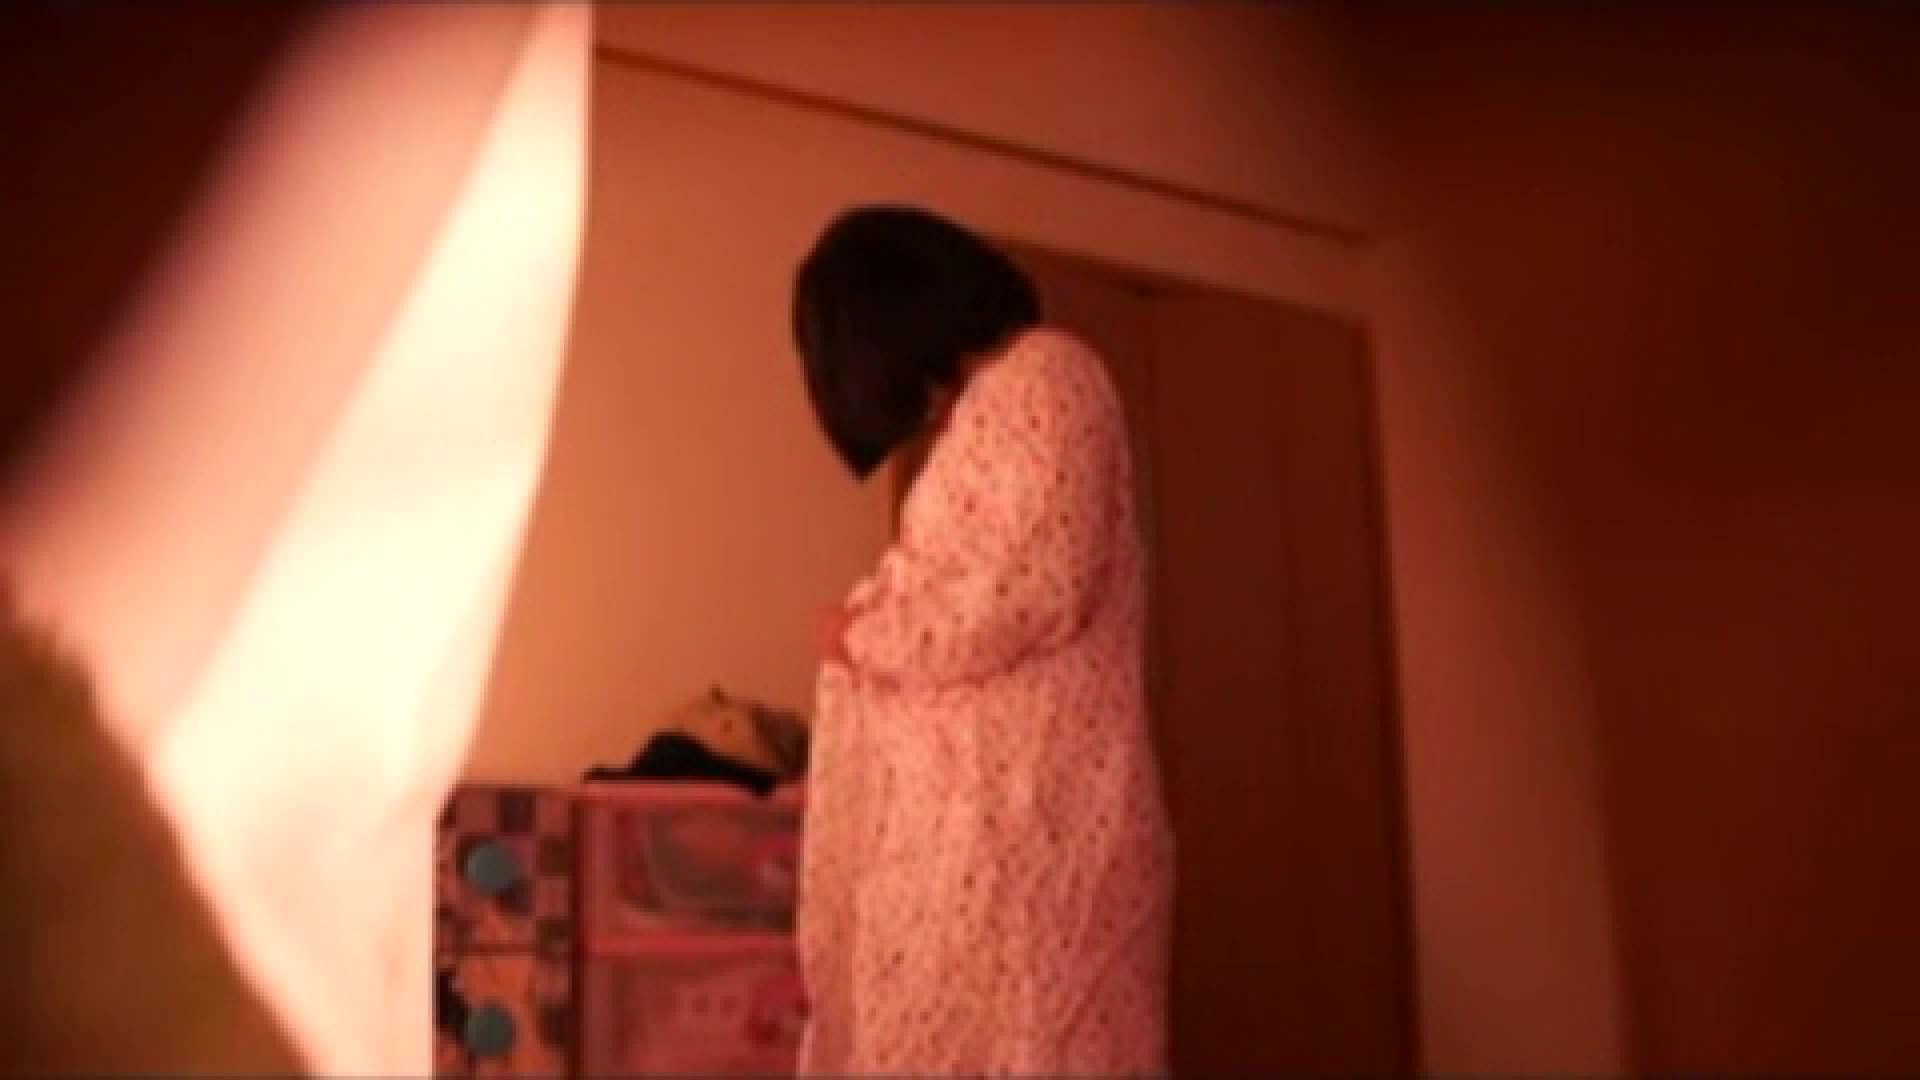 vol.2 まりこさんのお着替え、就寝前の映像です。 エッチすぎるOL達 | 着替えシーン  29連発 23